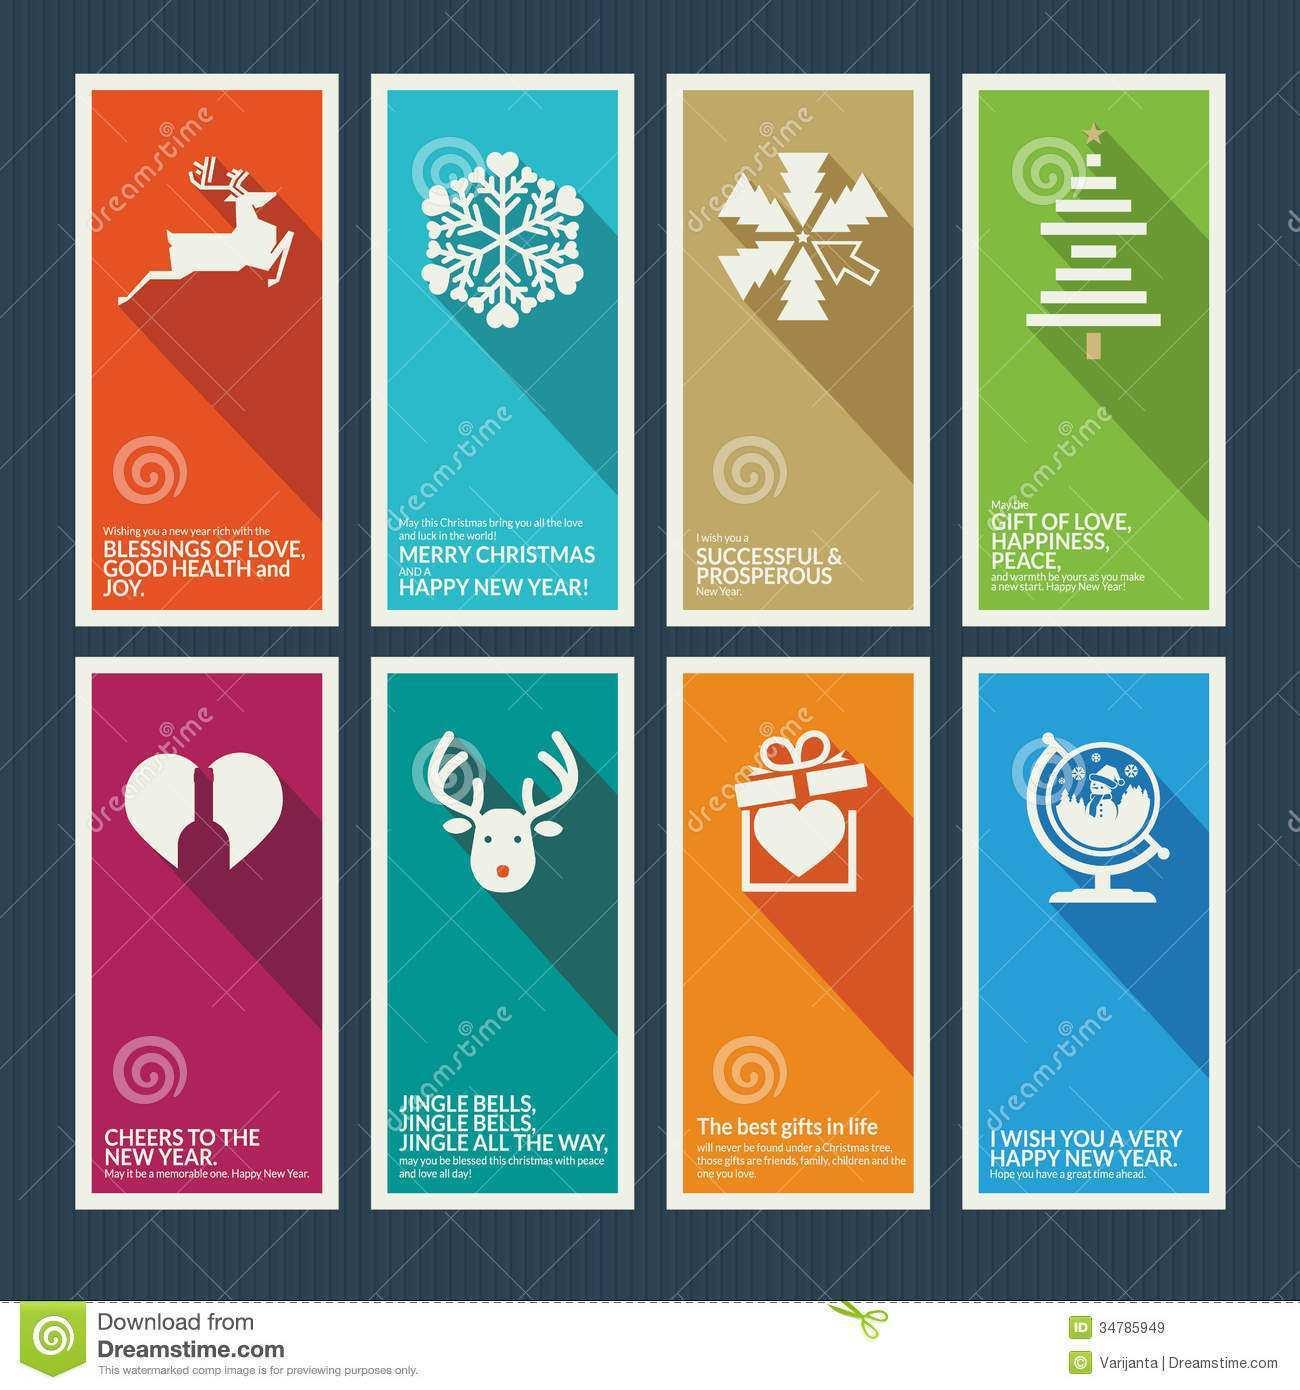 23 Creative Christmas Card Templates Adobe Illustrator Maker for Christmas Card Templates Adobe Illustrator